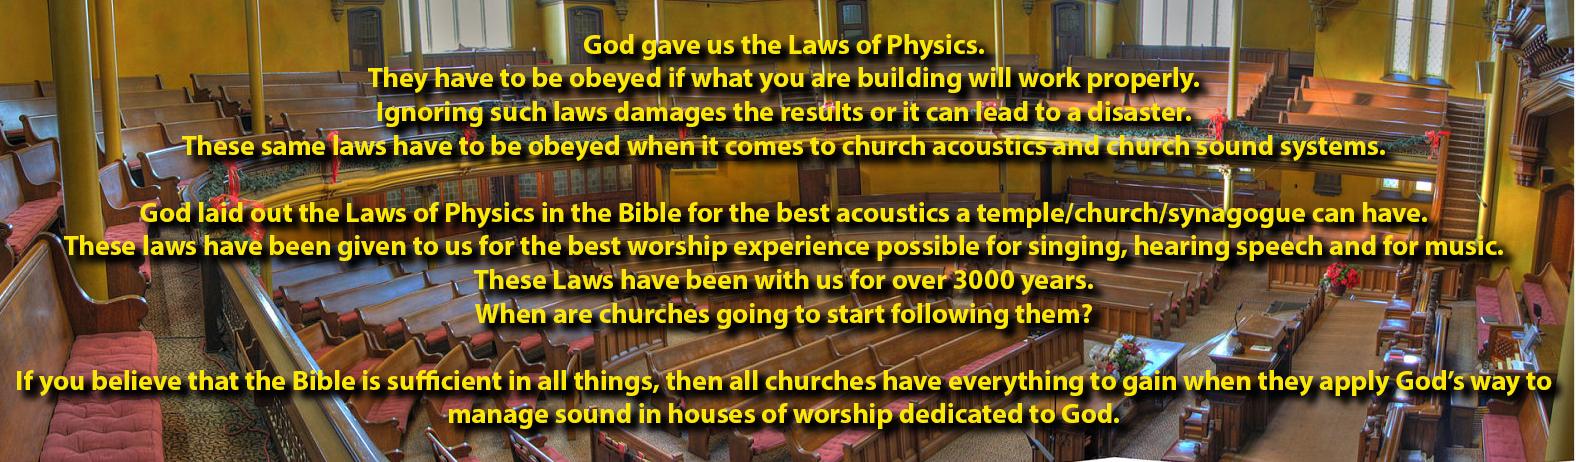 Church Acoustics & Sound Systems